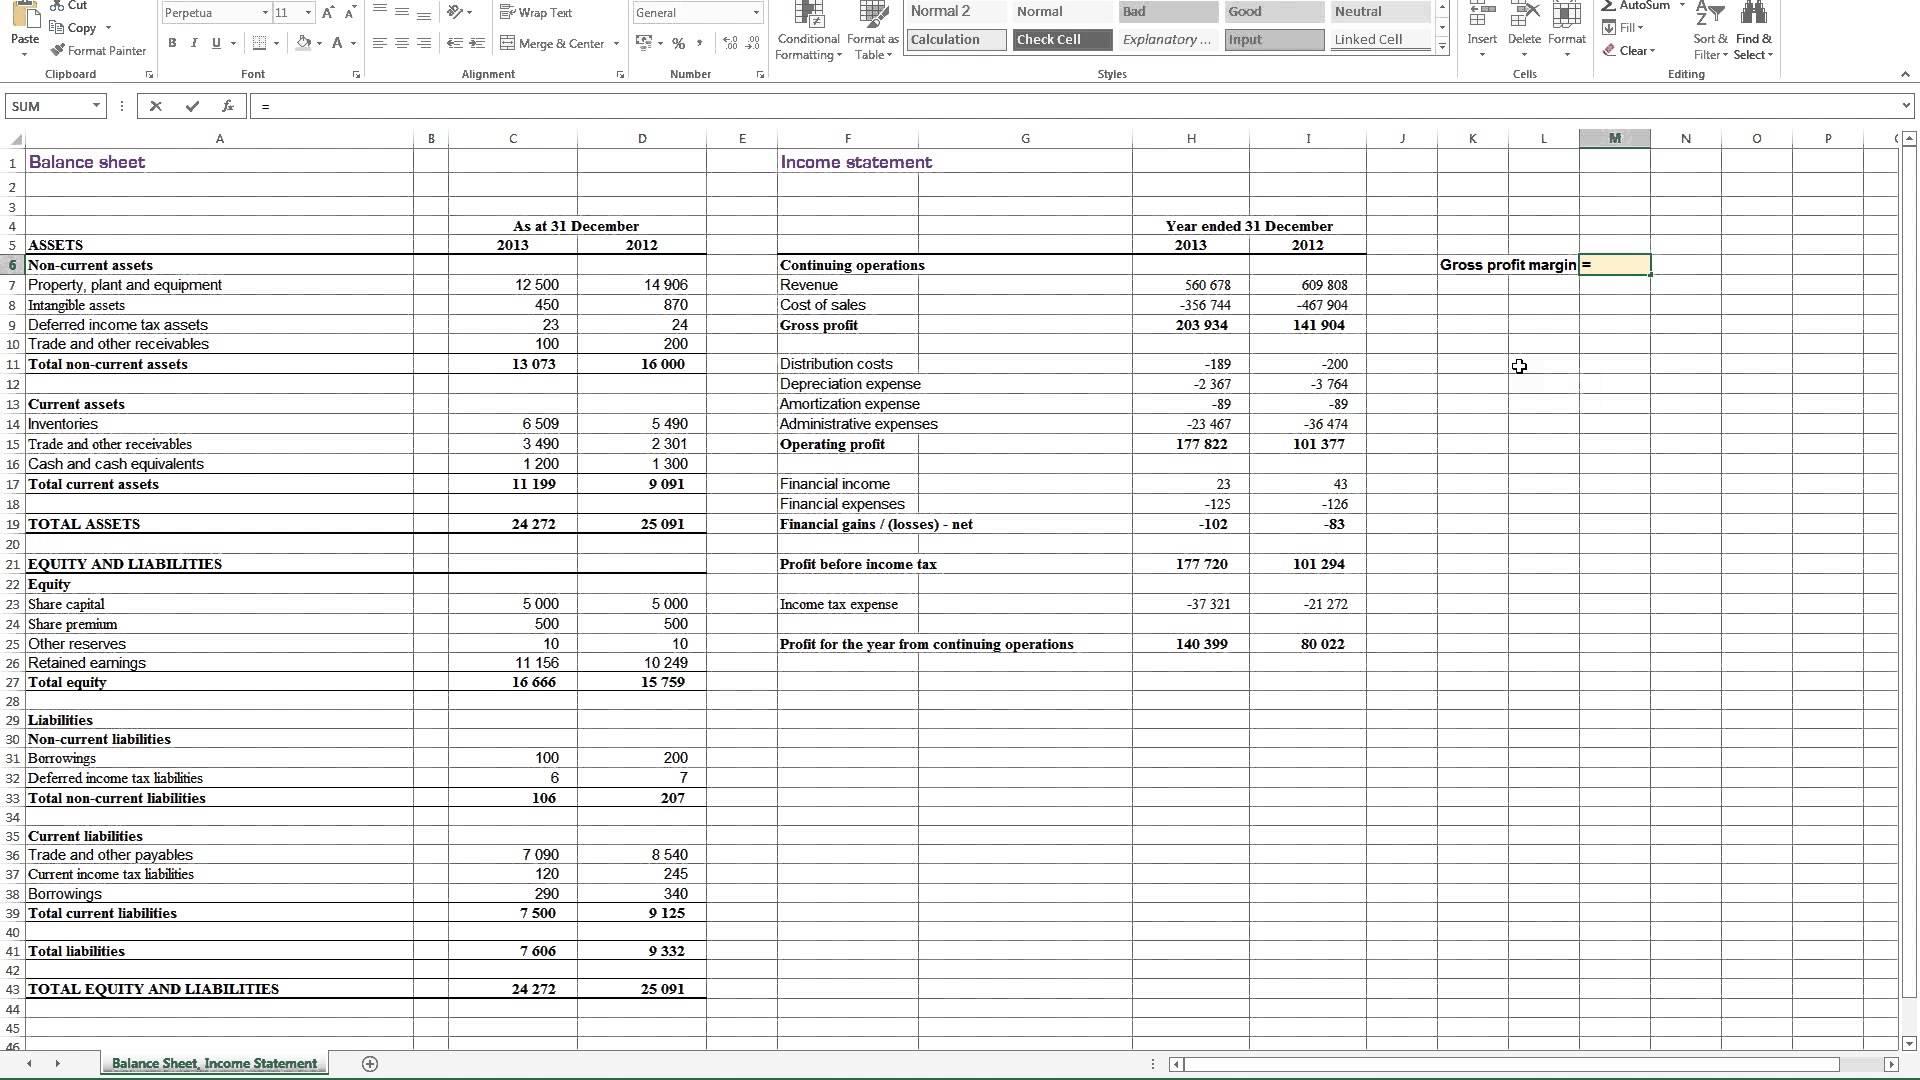 Profit Margin Template Excel - Resourcesaver Throughout Profit Margin Spreadsheet Template